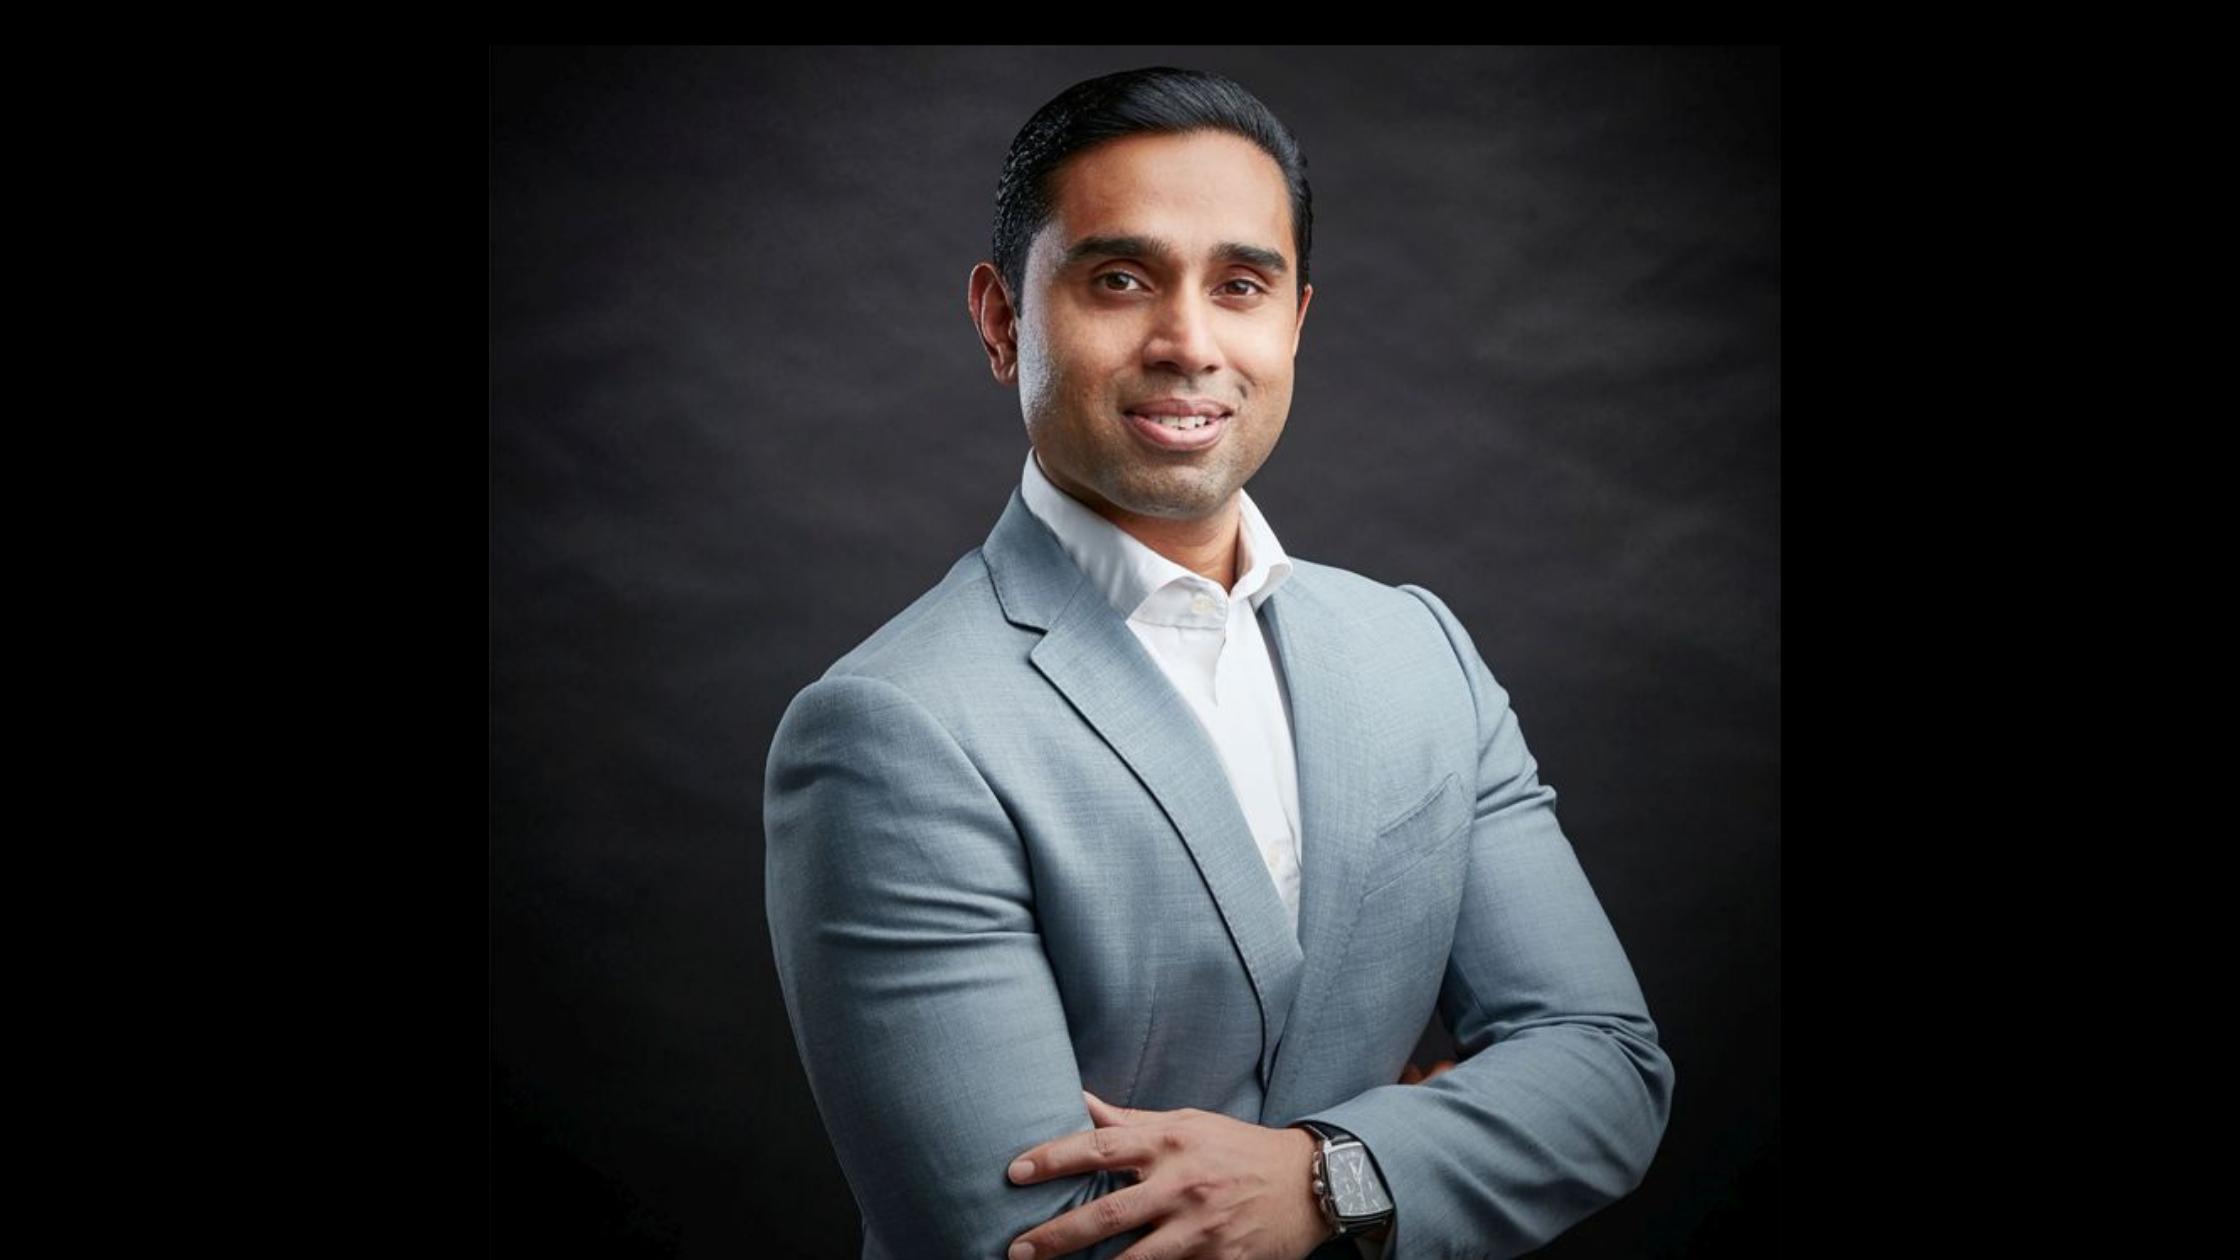 3Bridges Community New CEO Raj Nair